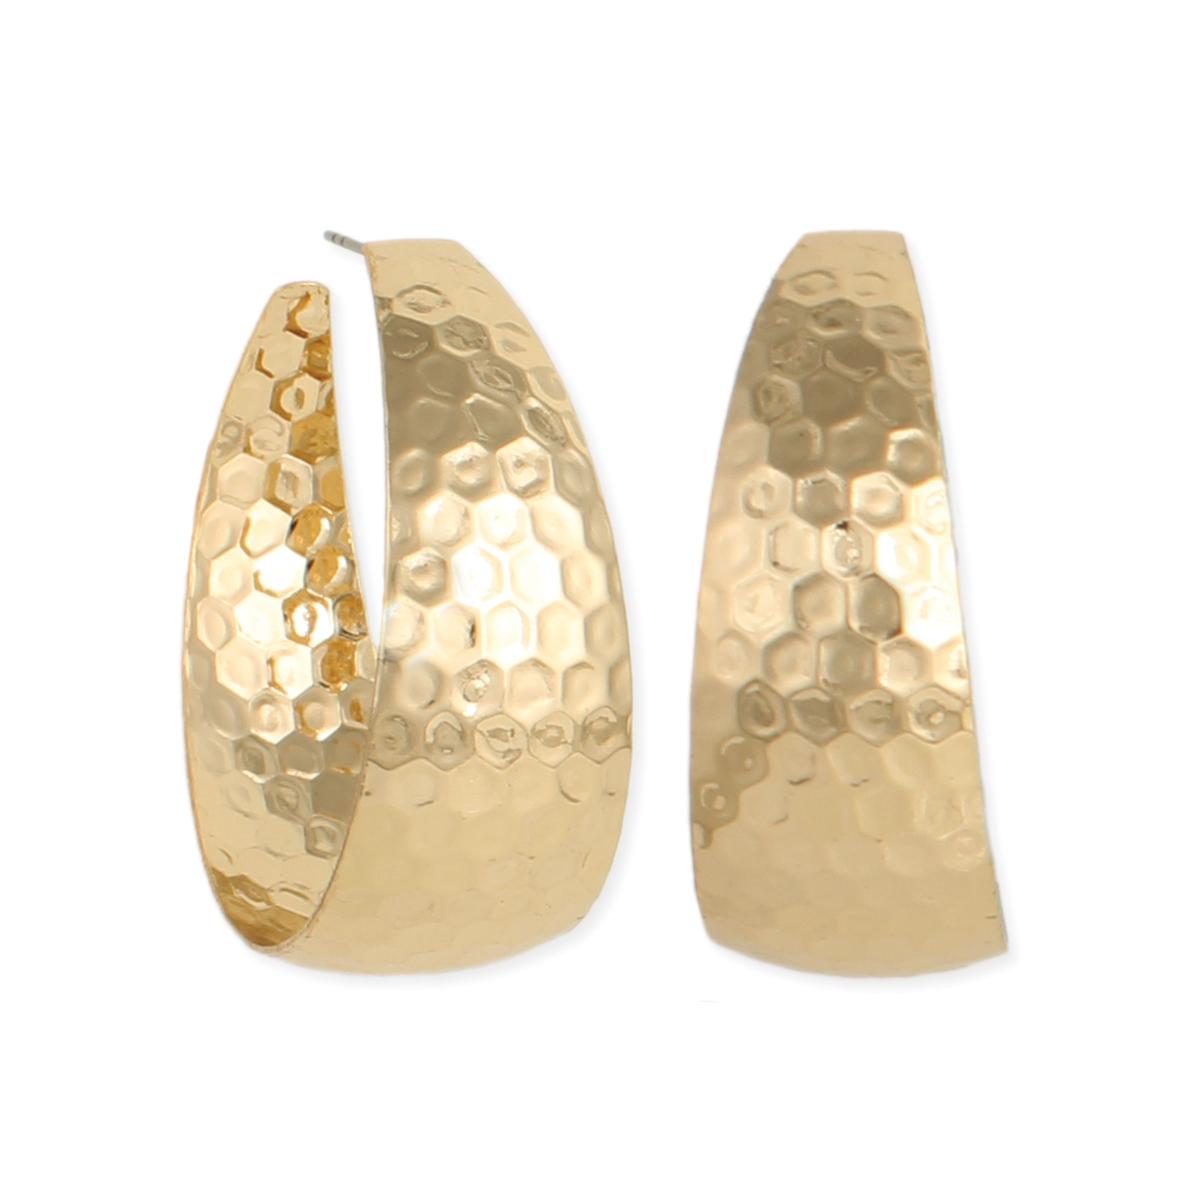 Elegant Hammered Gold Post Hoop Earrings View Detailed Images 2